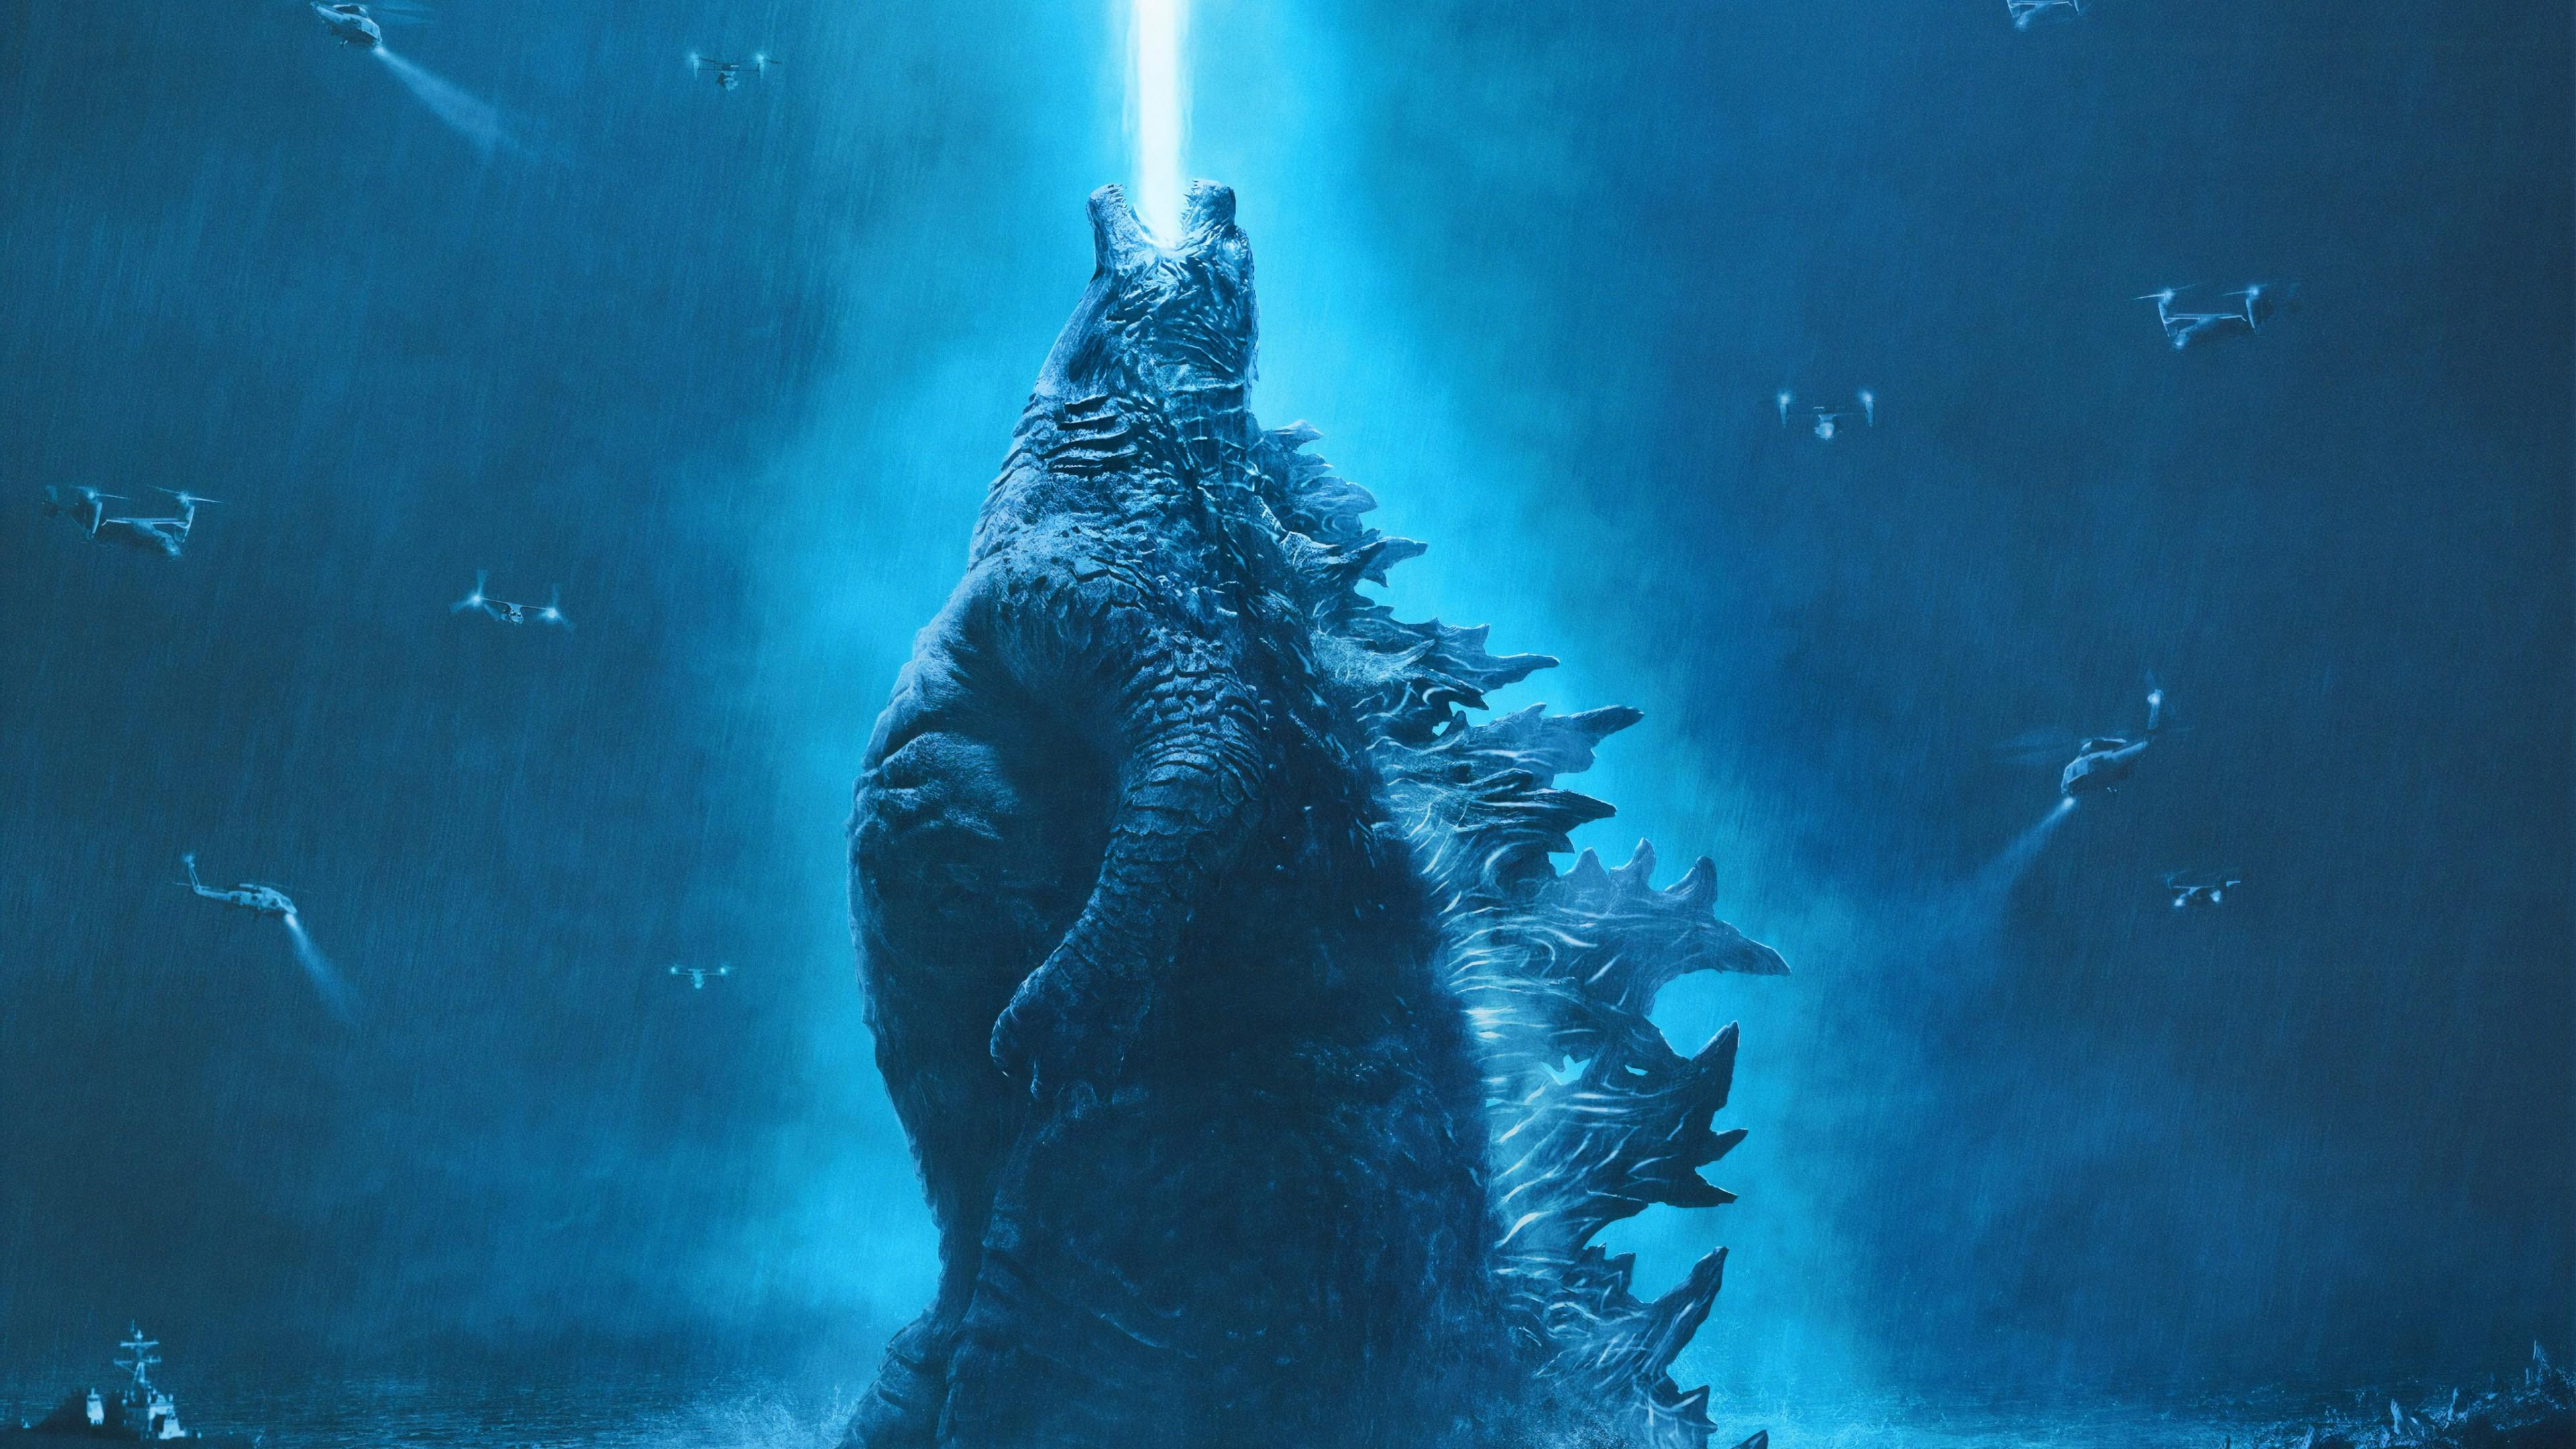 Hintergrundbilder  Godzilla King of the Monsters, Filme, blau ...